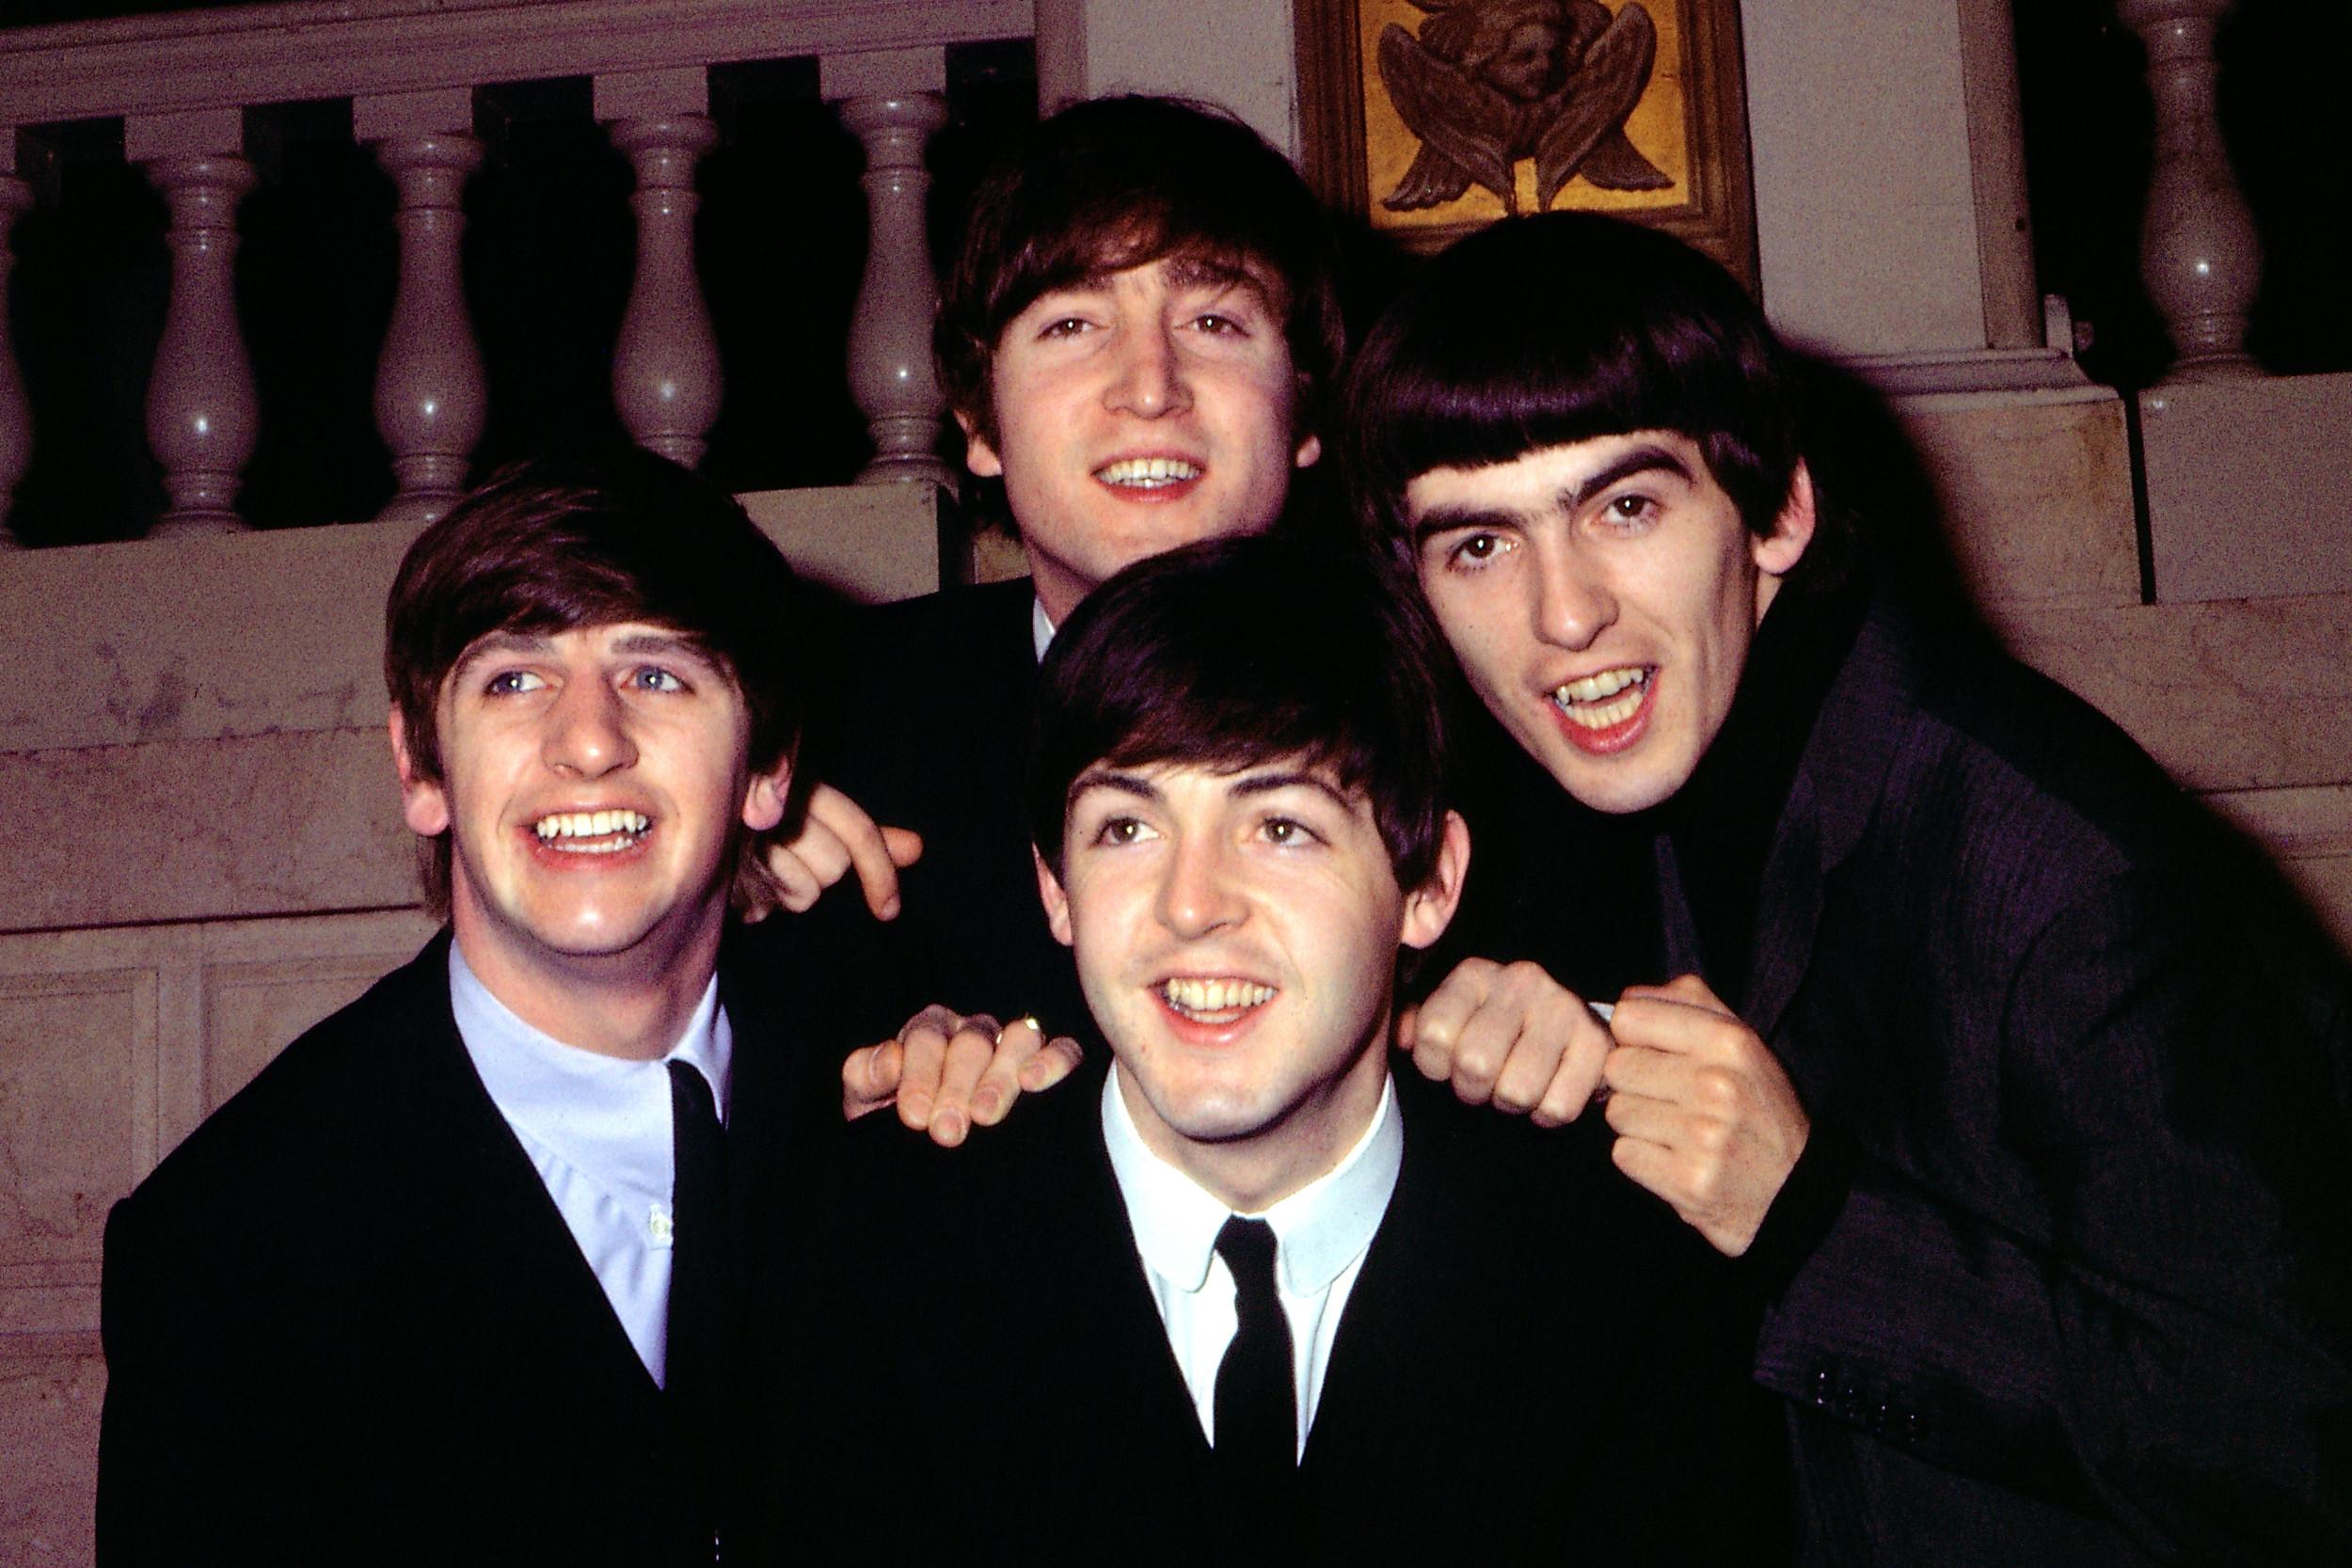 The Beatles are back, in spirit - The Sun-Gazette Newspaper